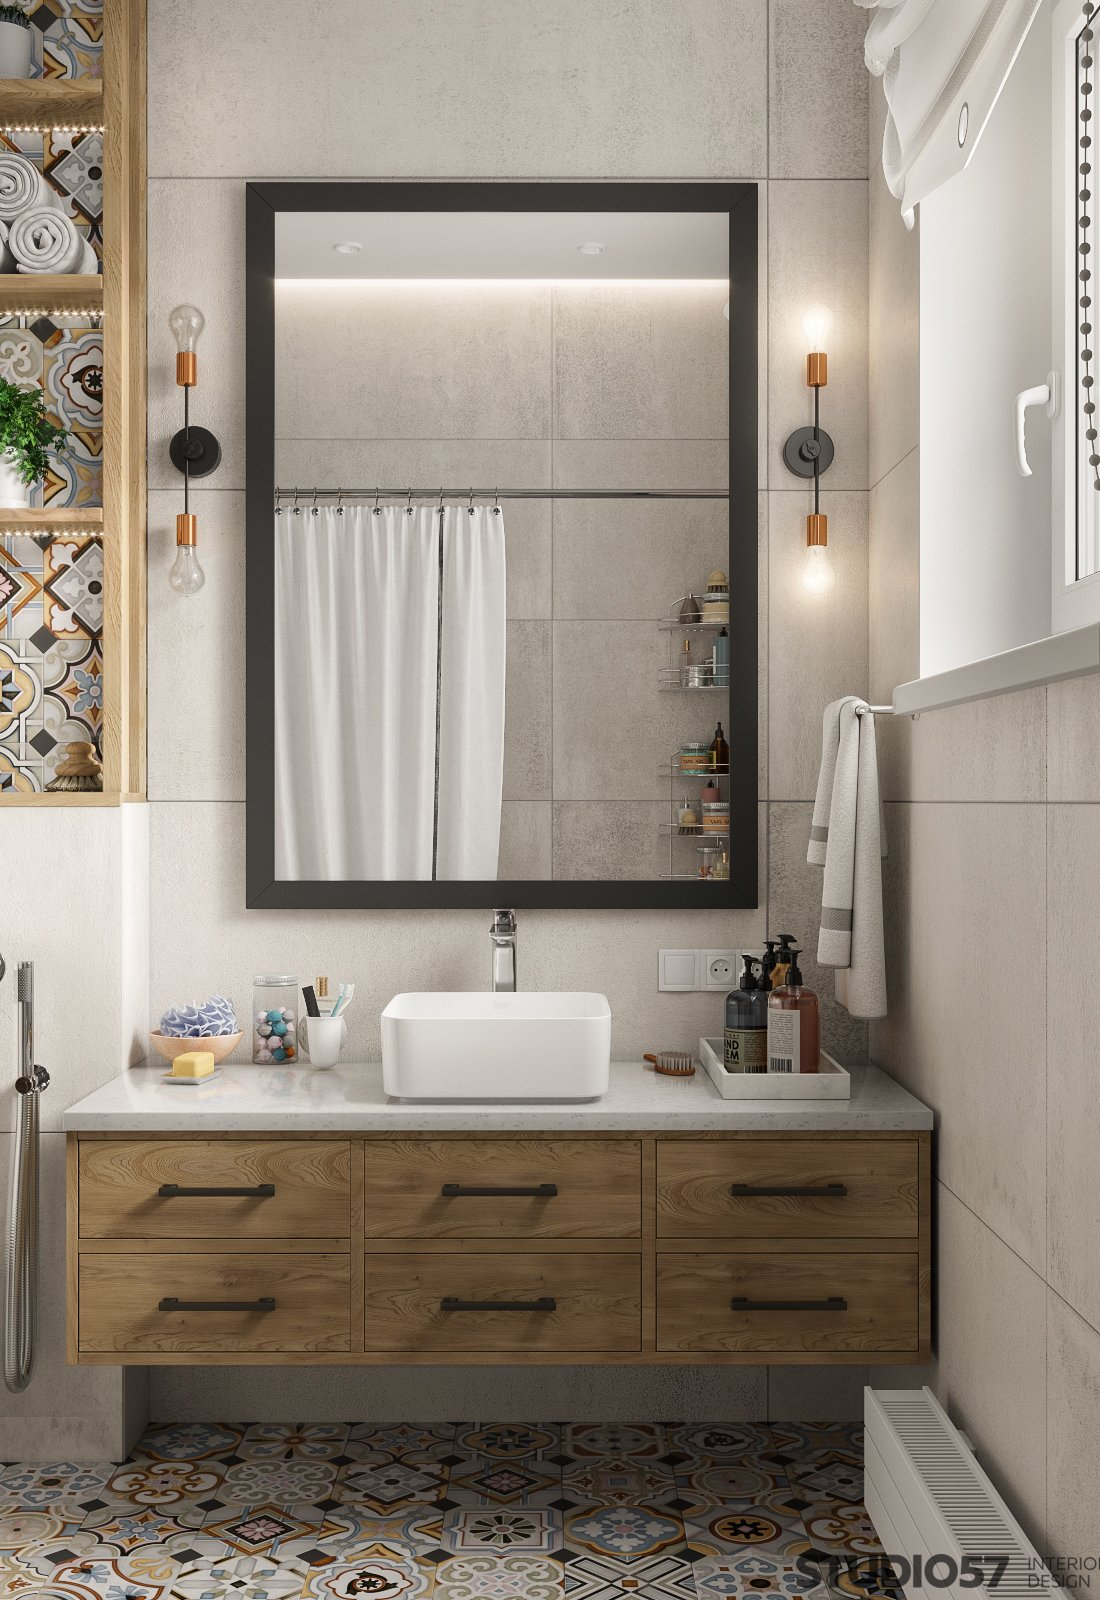 Bathroom interior design in Contemporary style